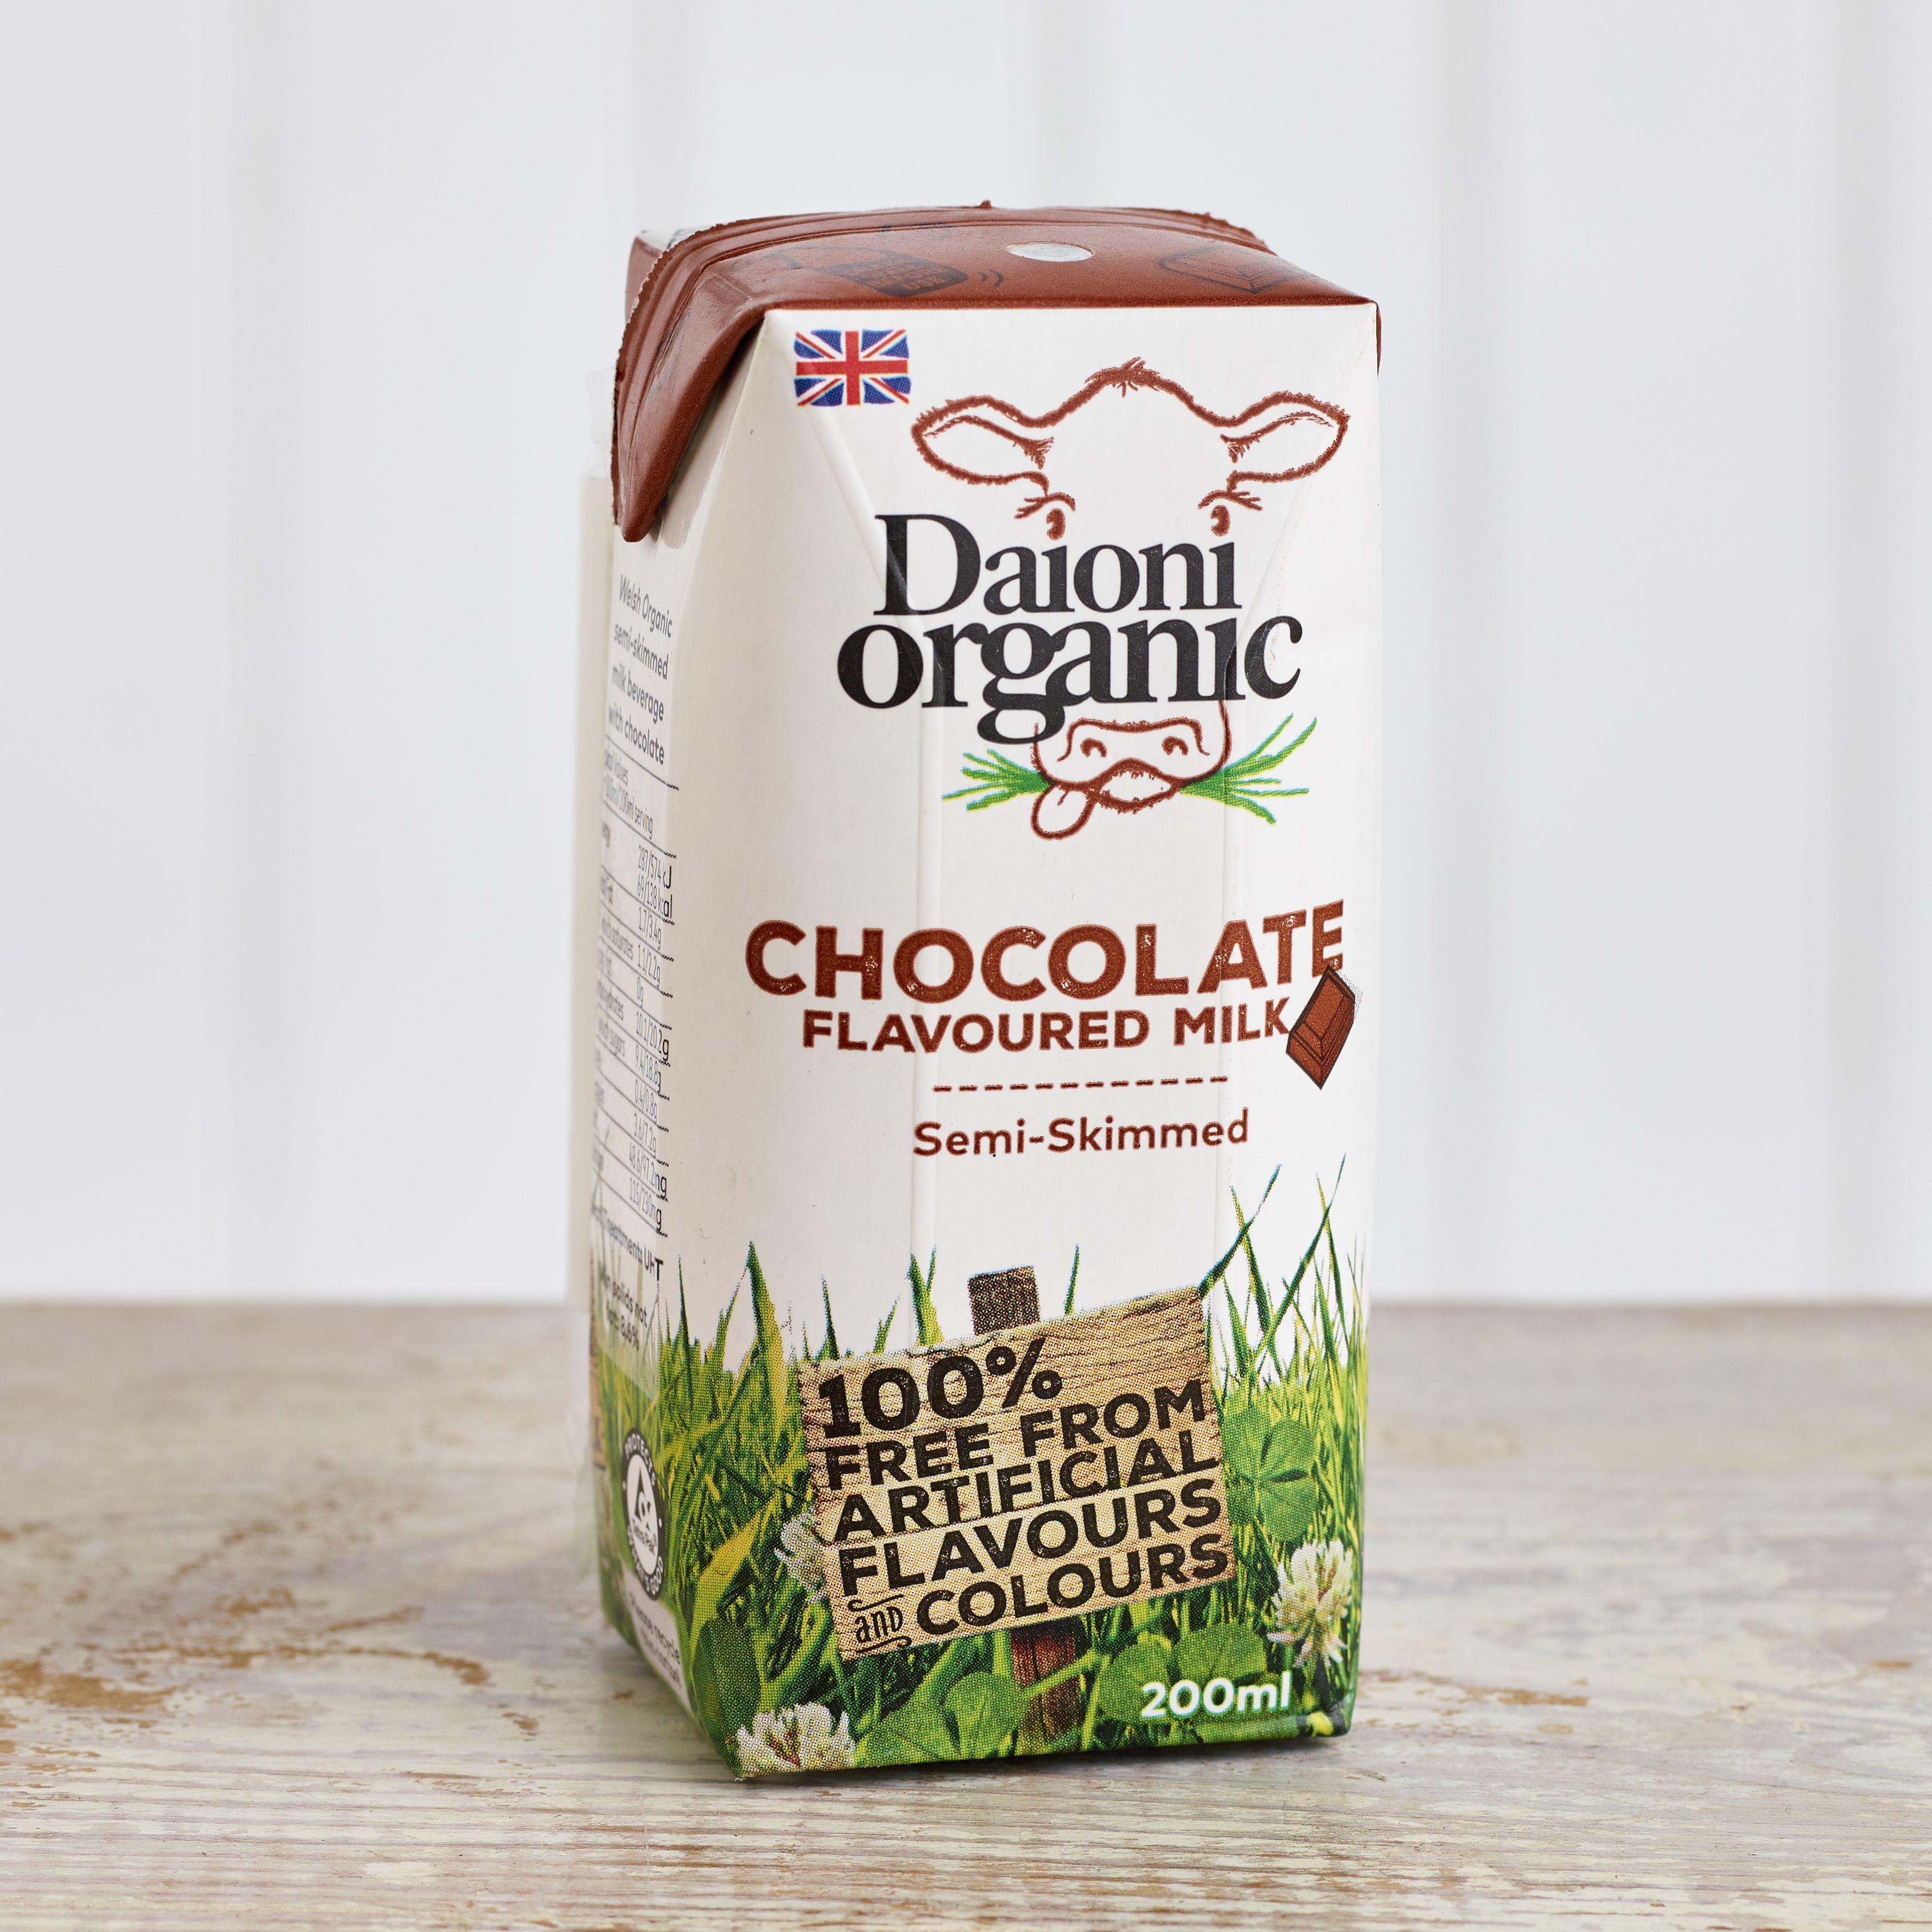 Daioni Organic Chocolate Flavoured Milk, 200ml